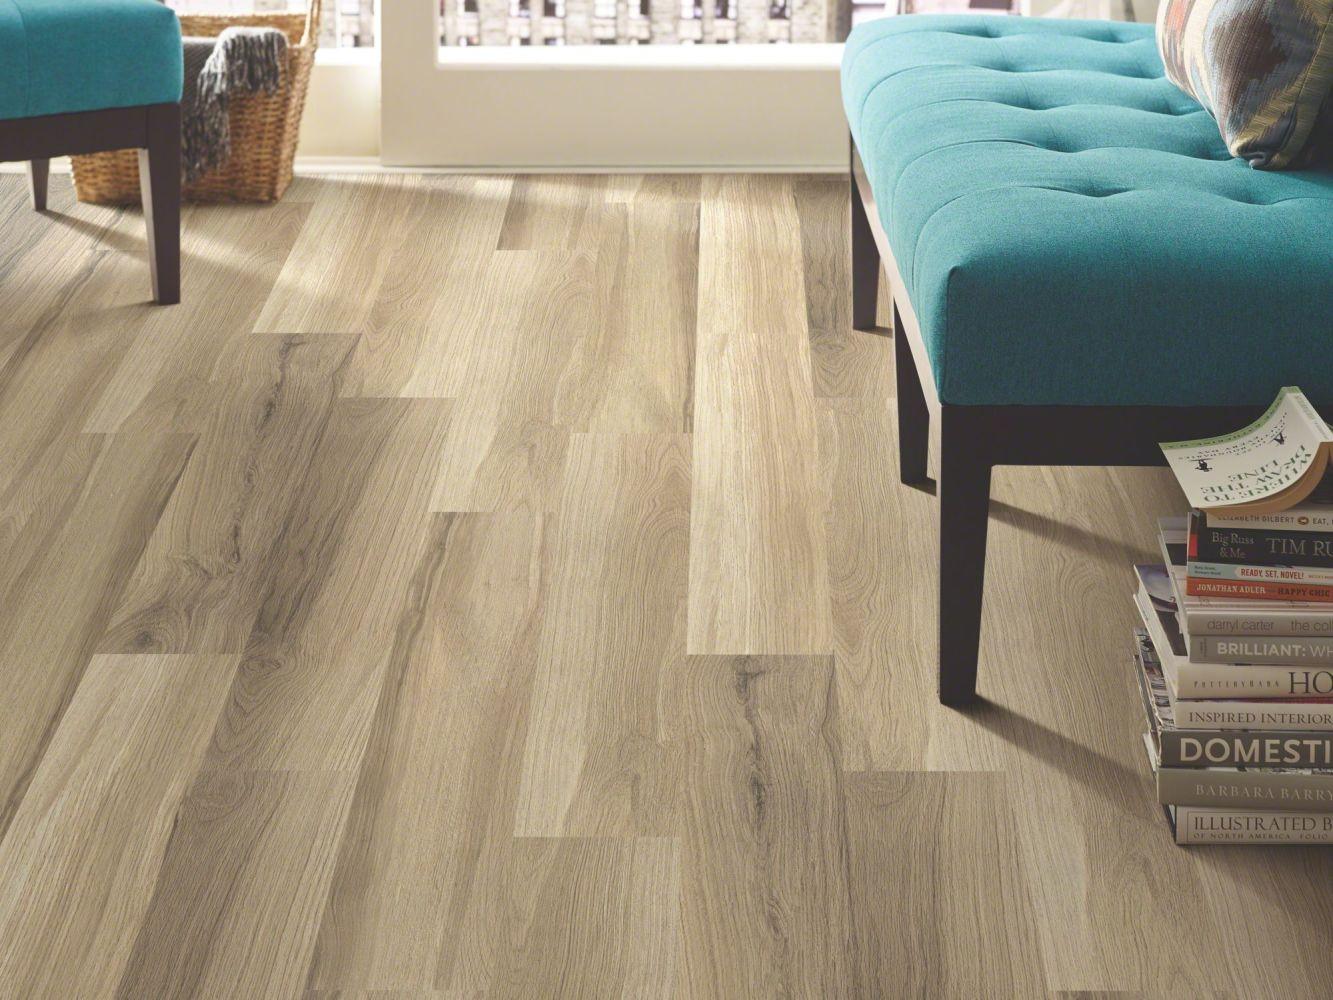 Shaw Floors Resilient Residential Piancavallo Plus Almond Oak 00154_HSS47